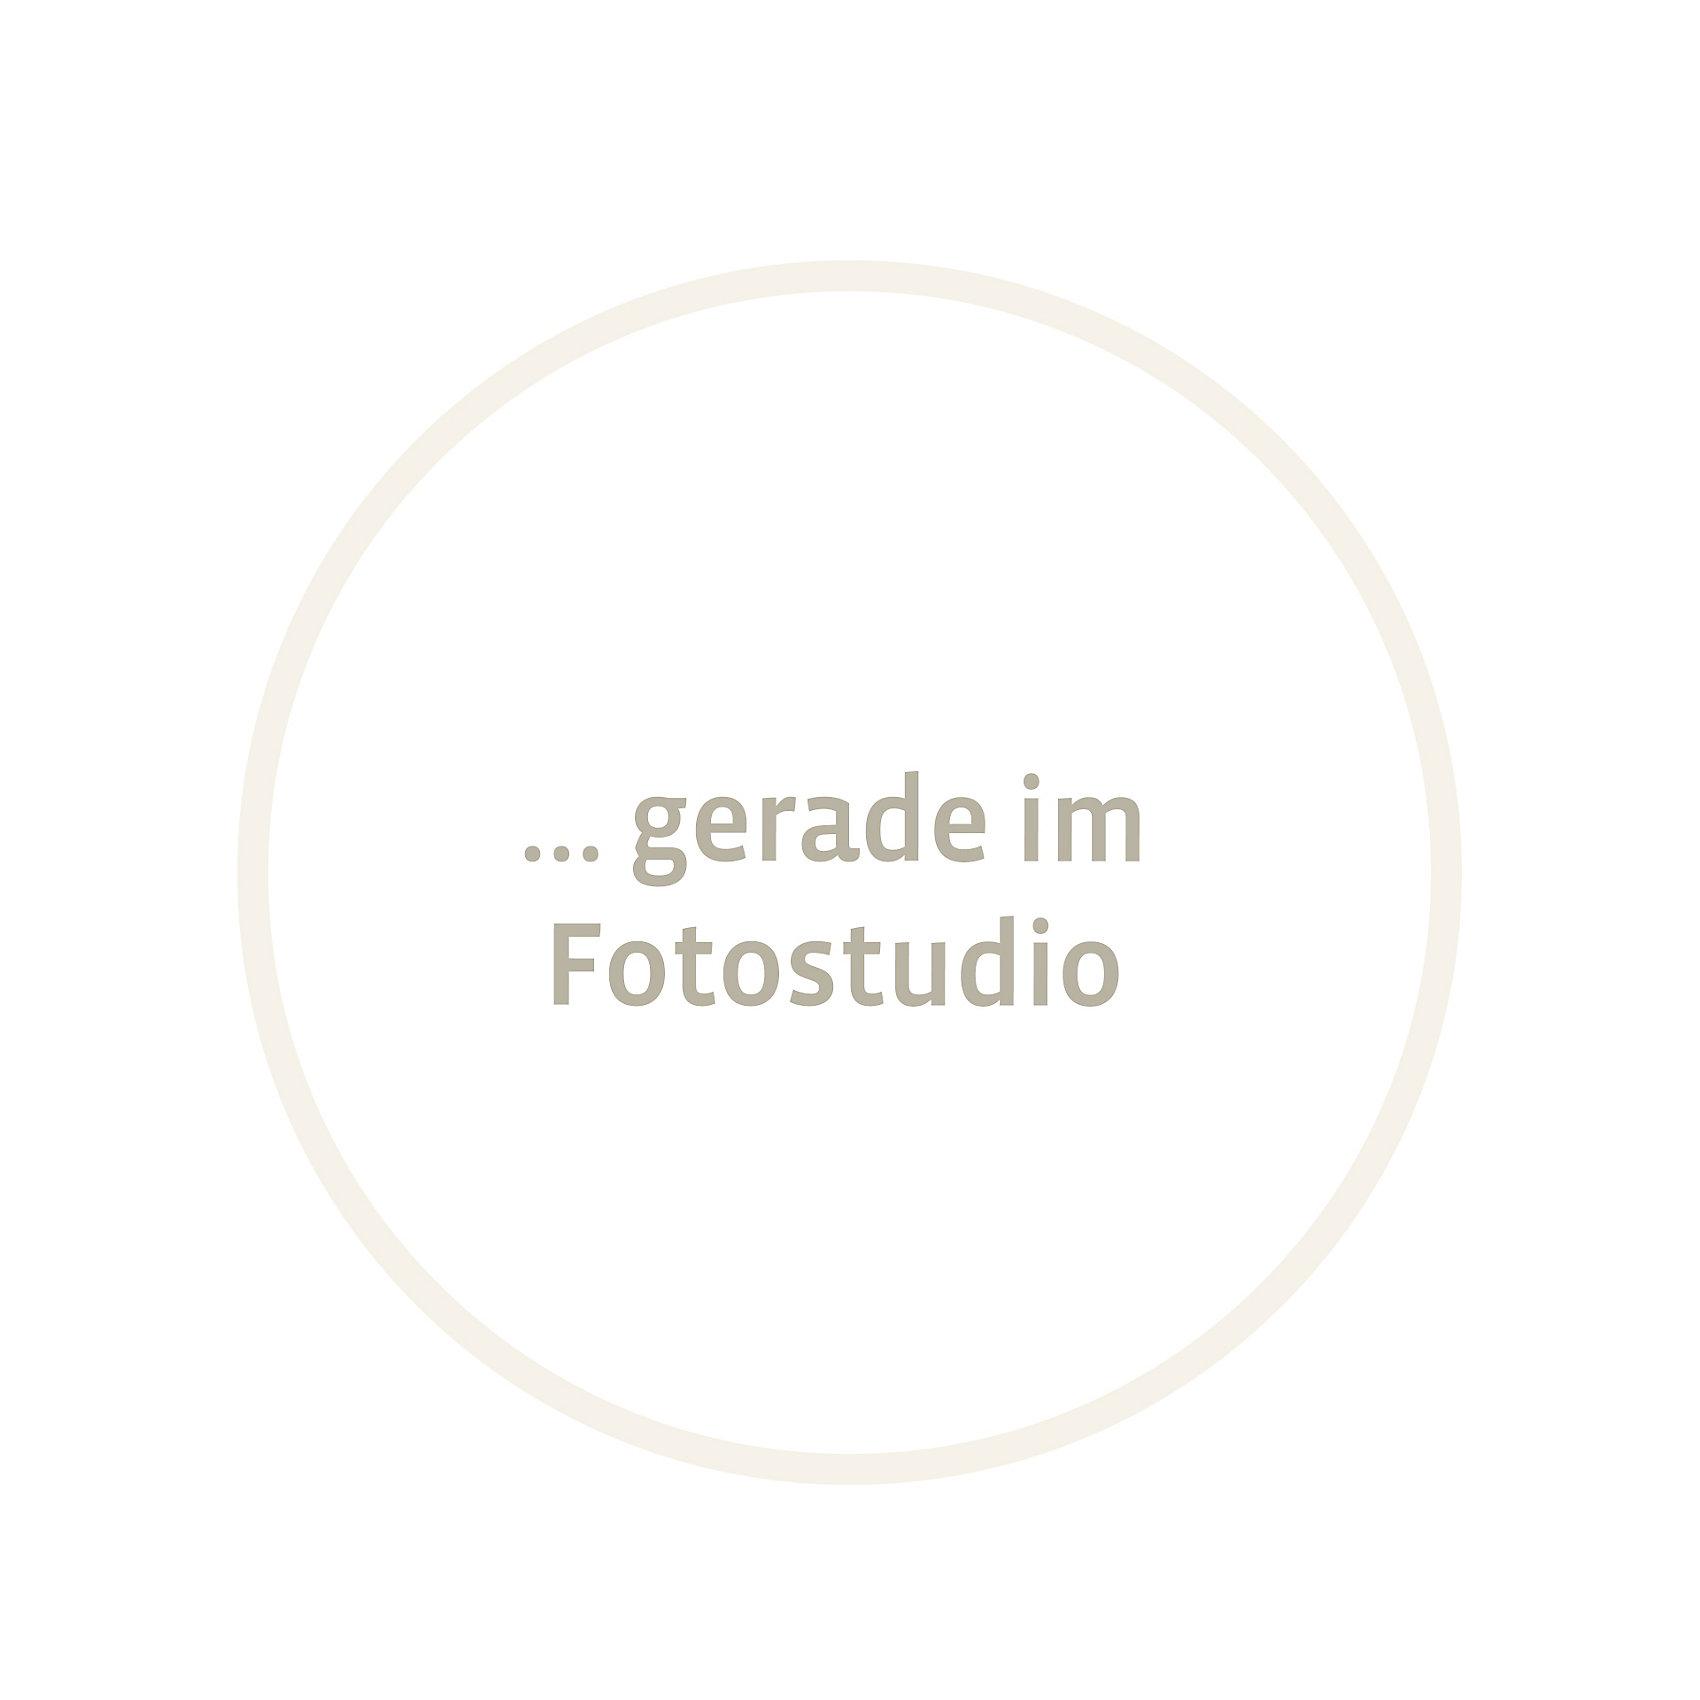 Aberlady Pepe Grau Low Für 7208028 Silber Jeans Fresh Sneakers Neu Damen iZPXuOk